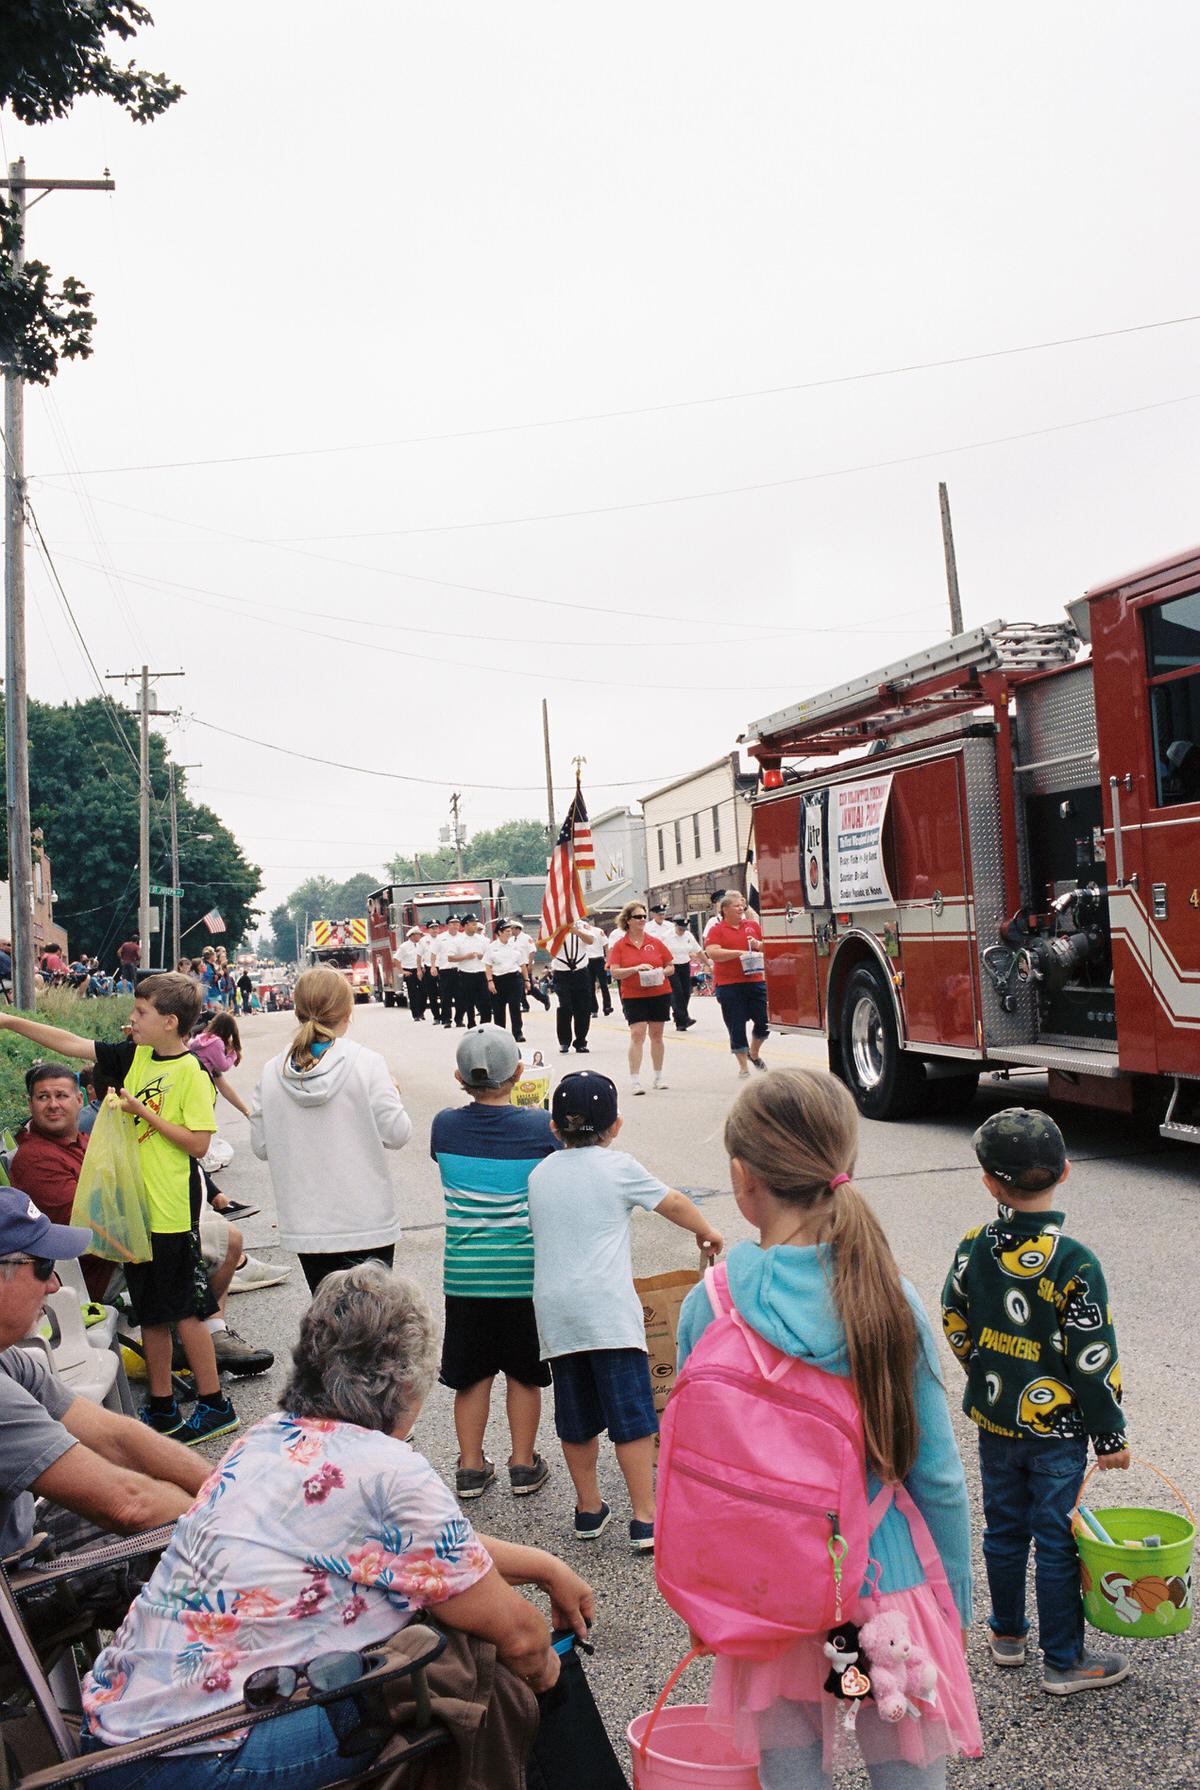 Mount-Calvary-Firemens-Picnic-Parade-Wisconsin-fine-art-film-photography-by-Studio-L-photographer-Laura-Schneider-_022